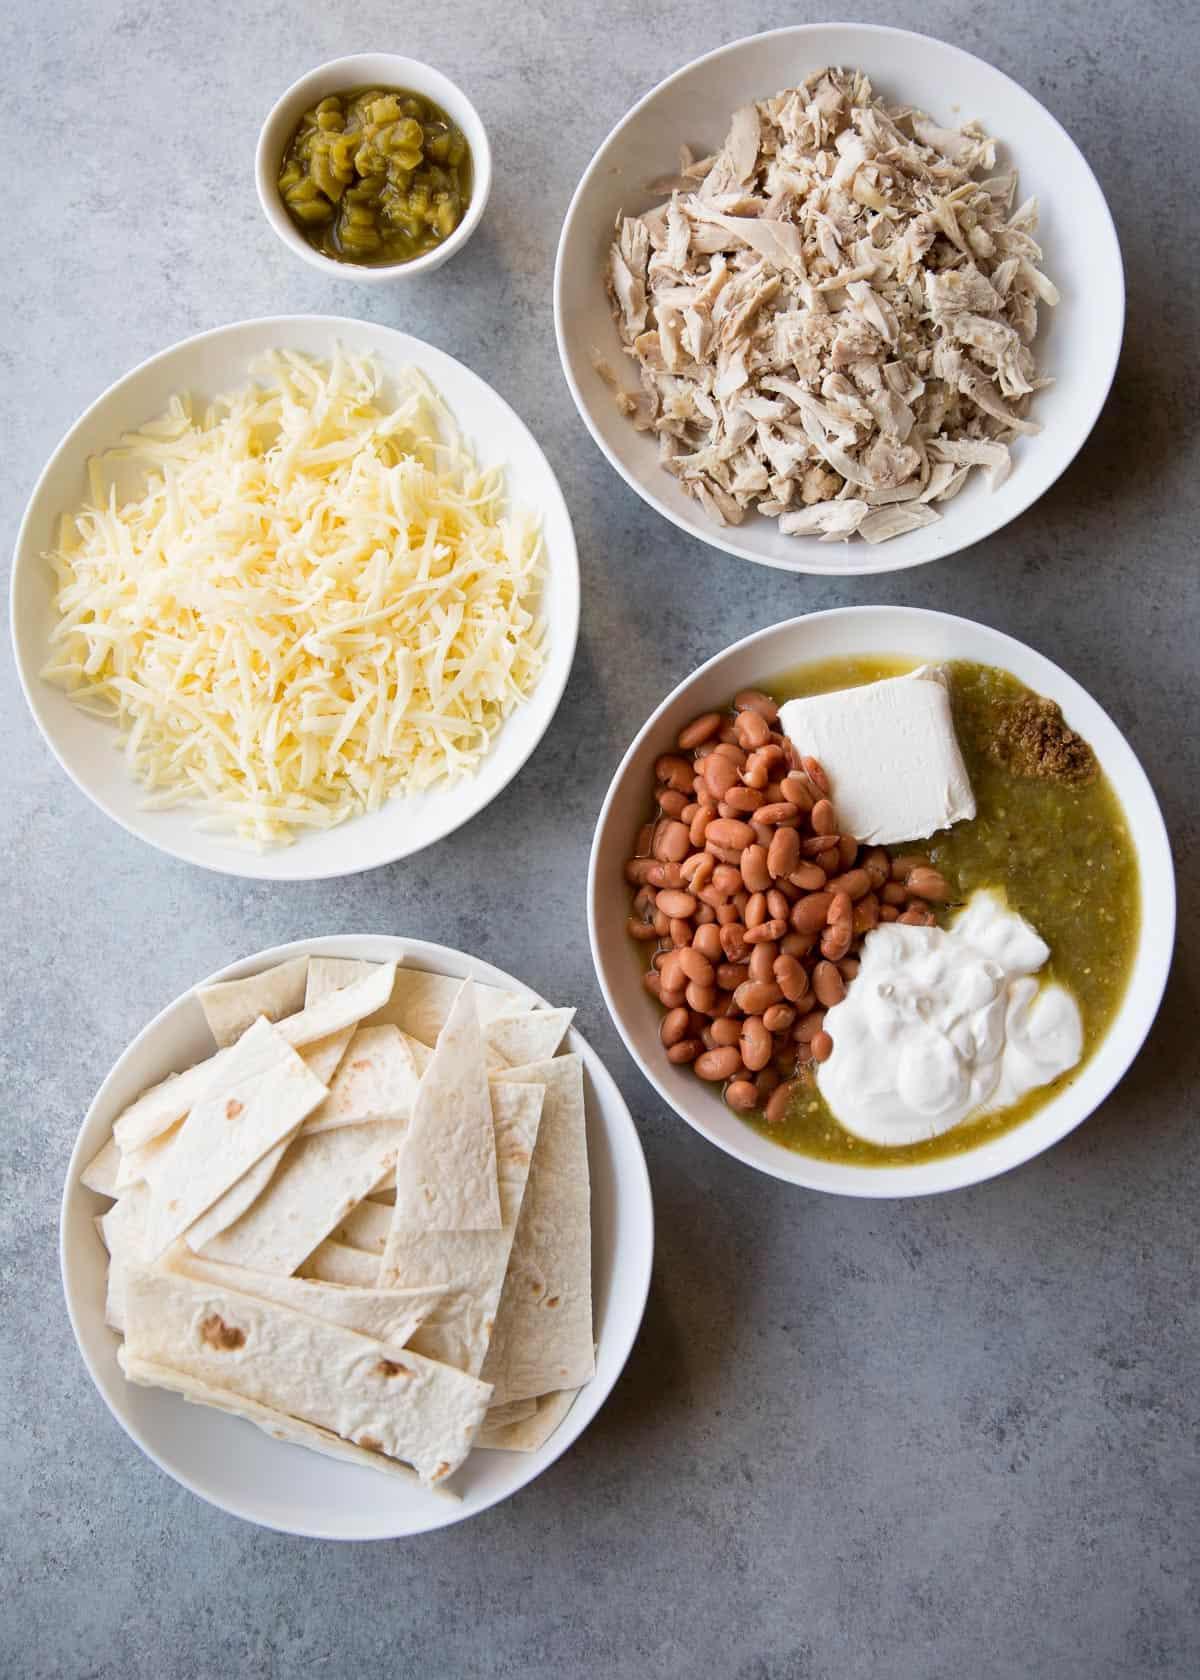 ingredients for chicken casserole in white bowls